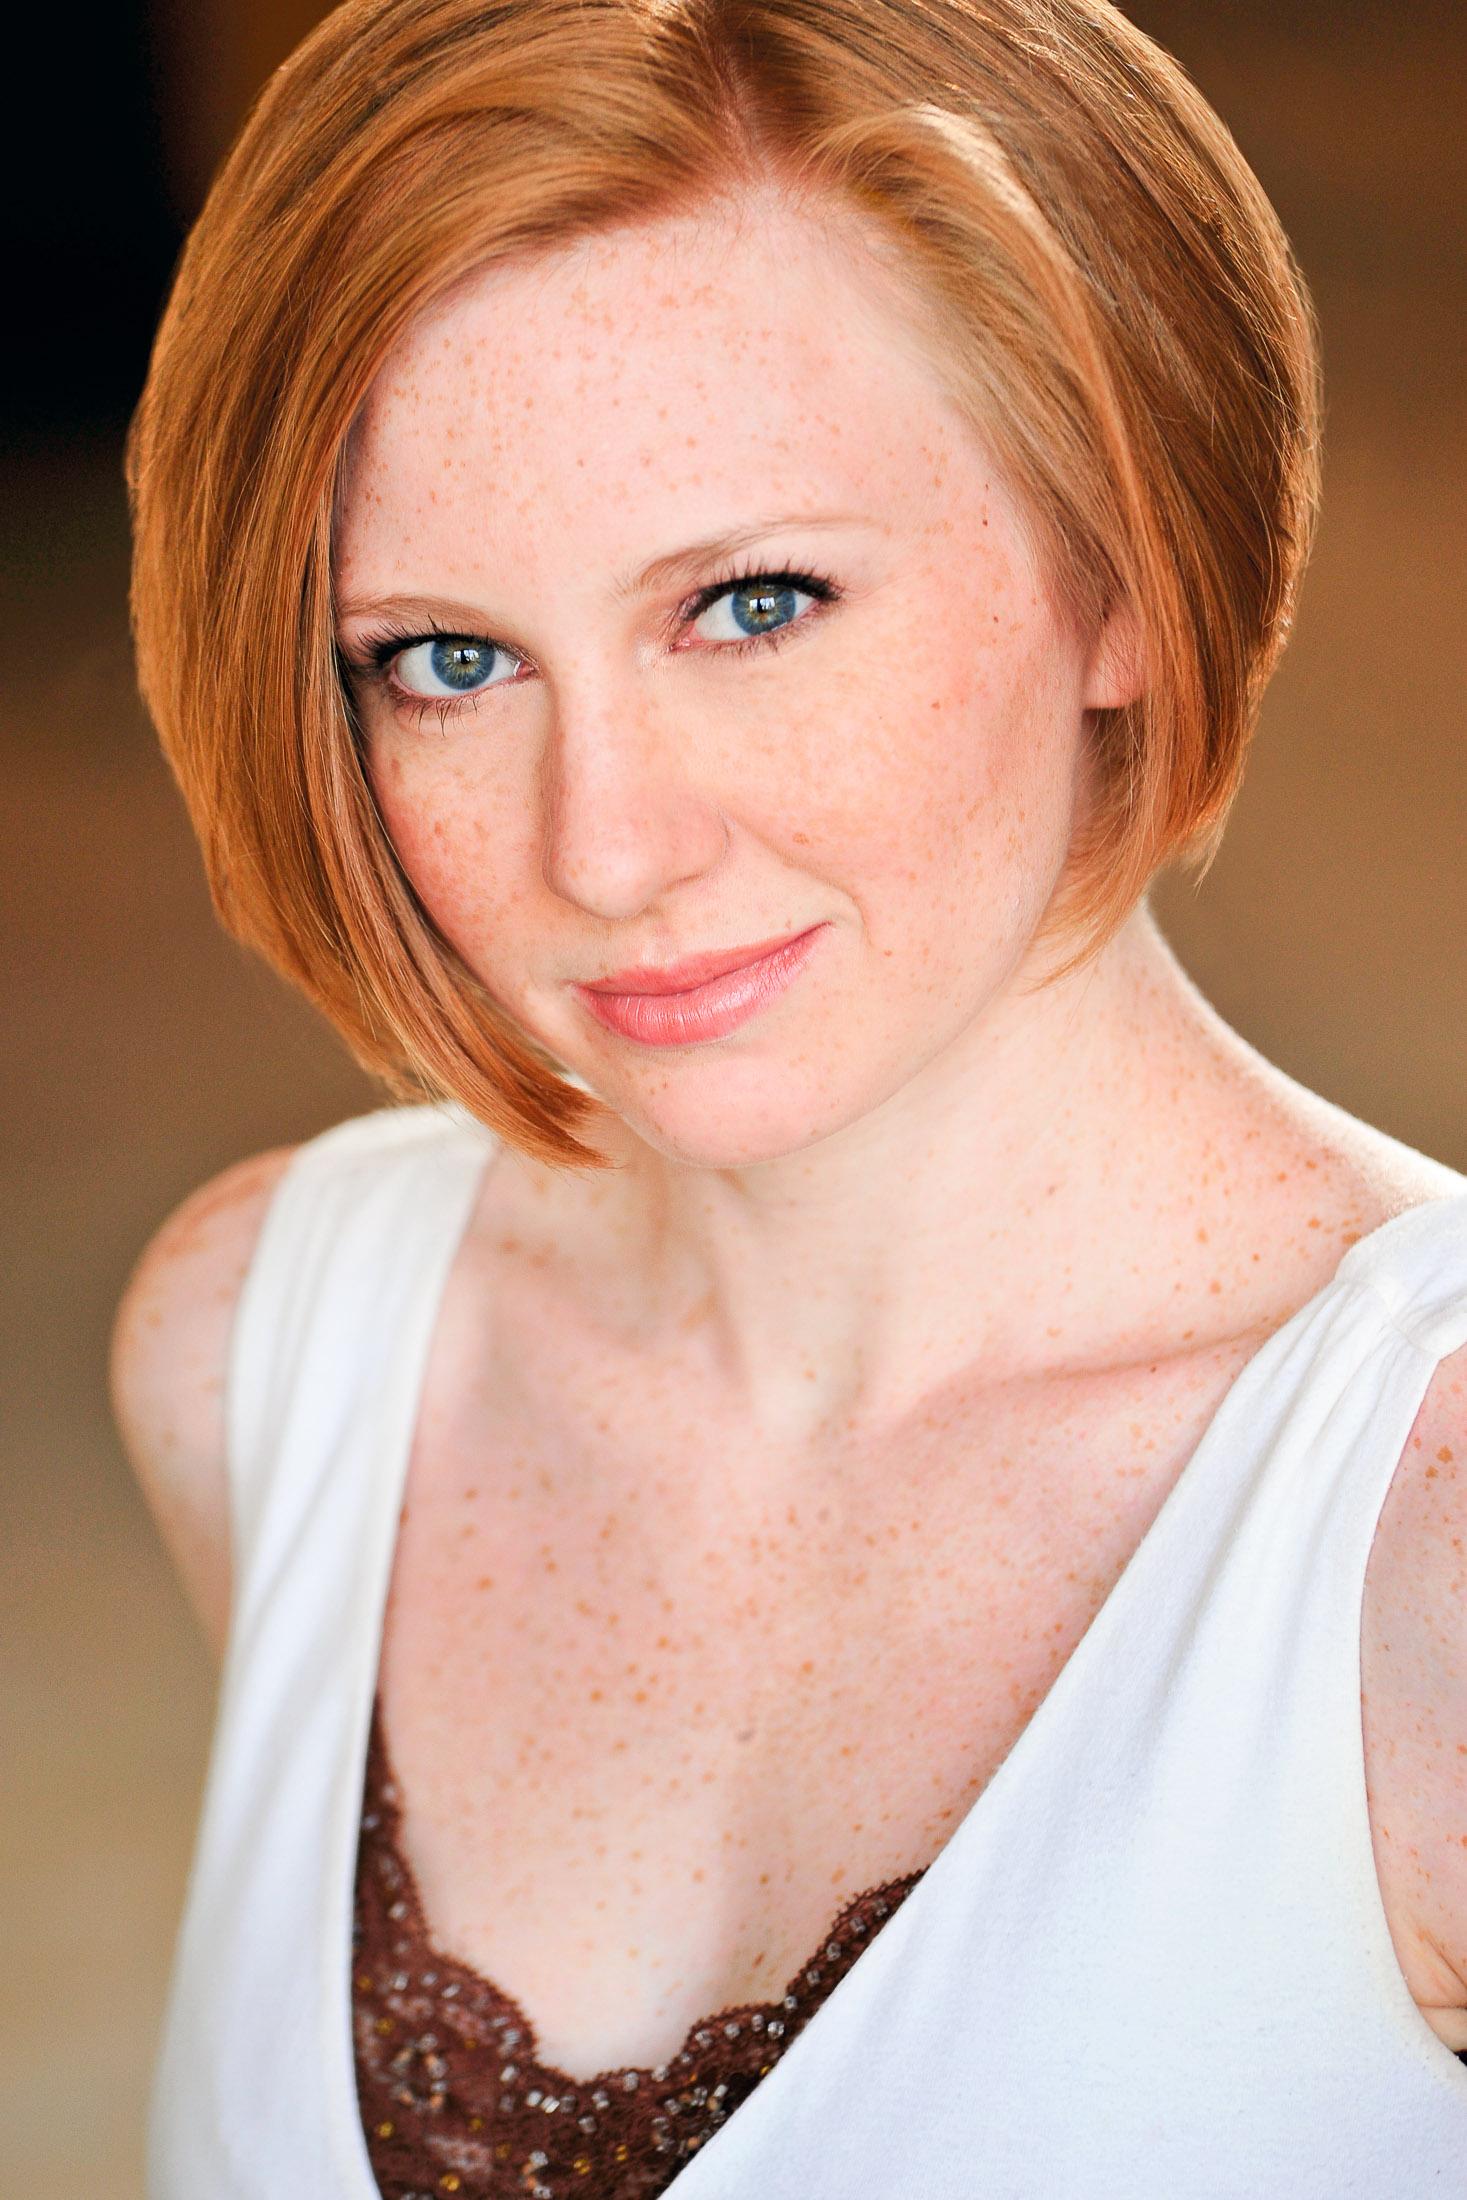 Headshots NYC - Actor Headshots Elise L